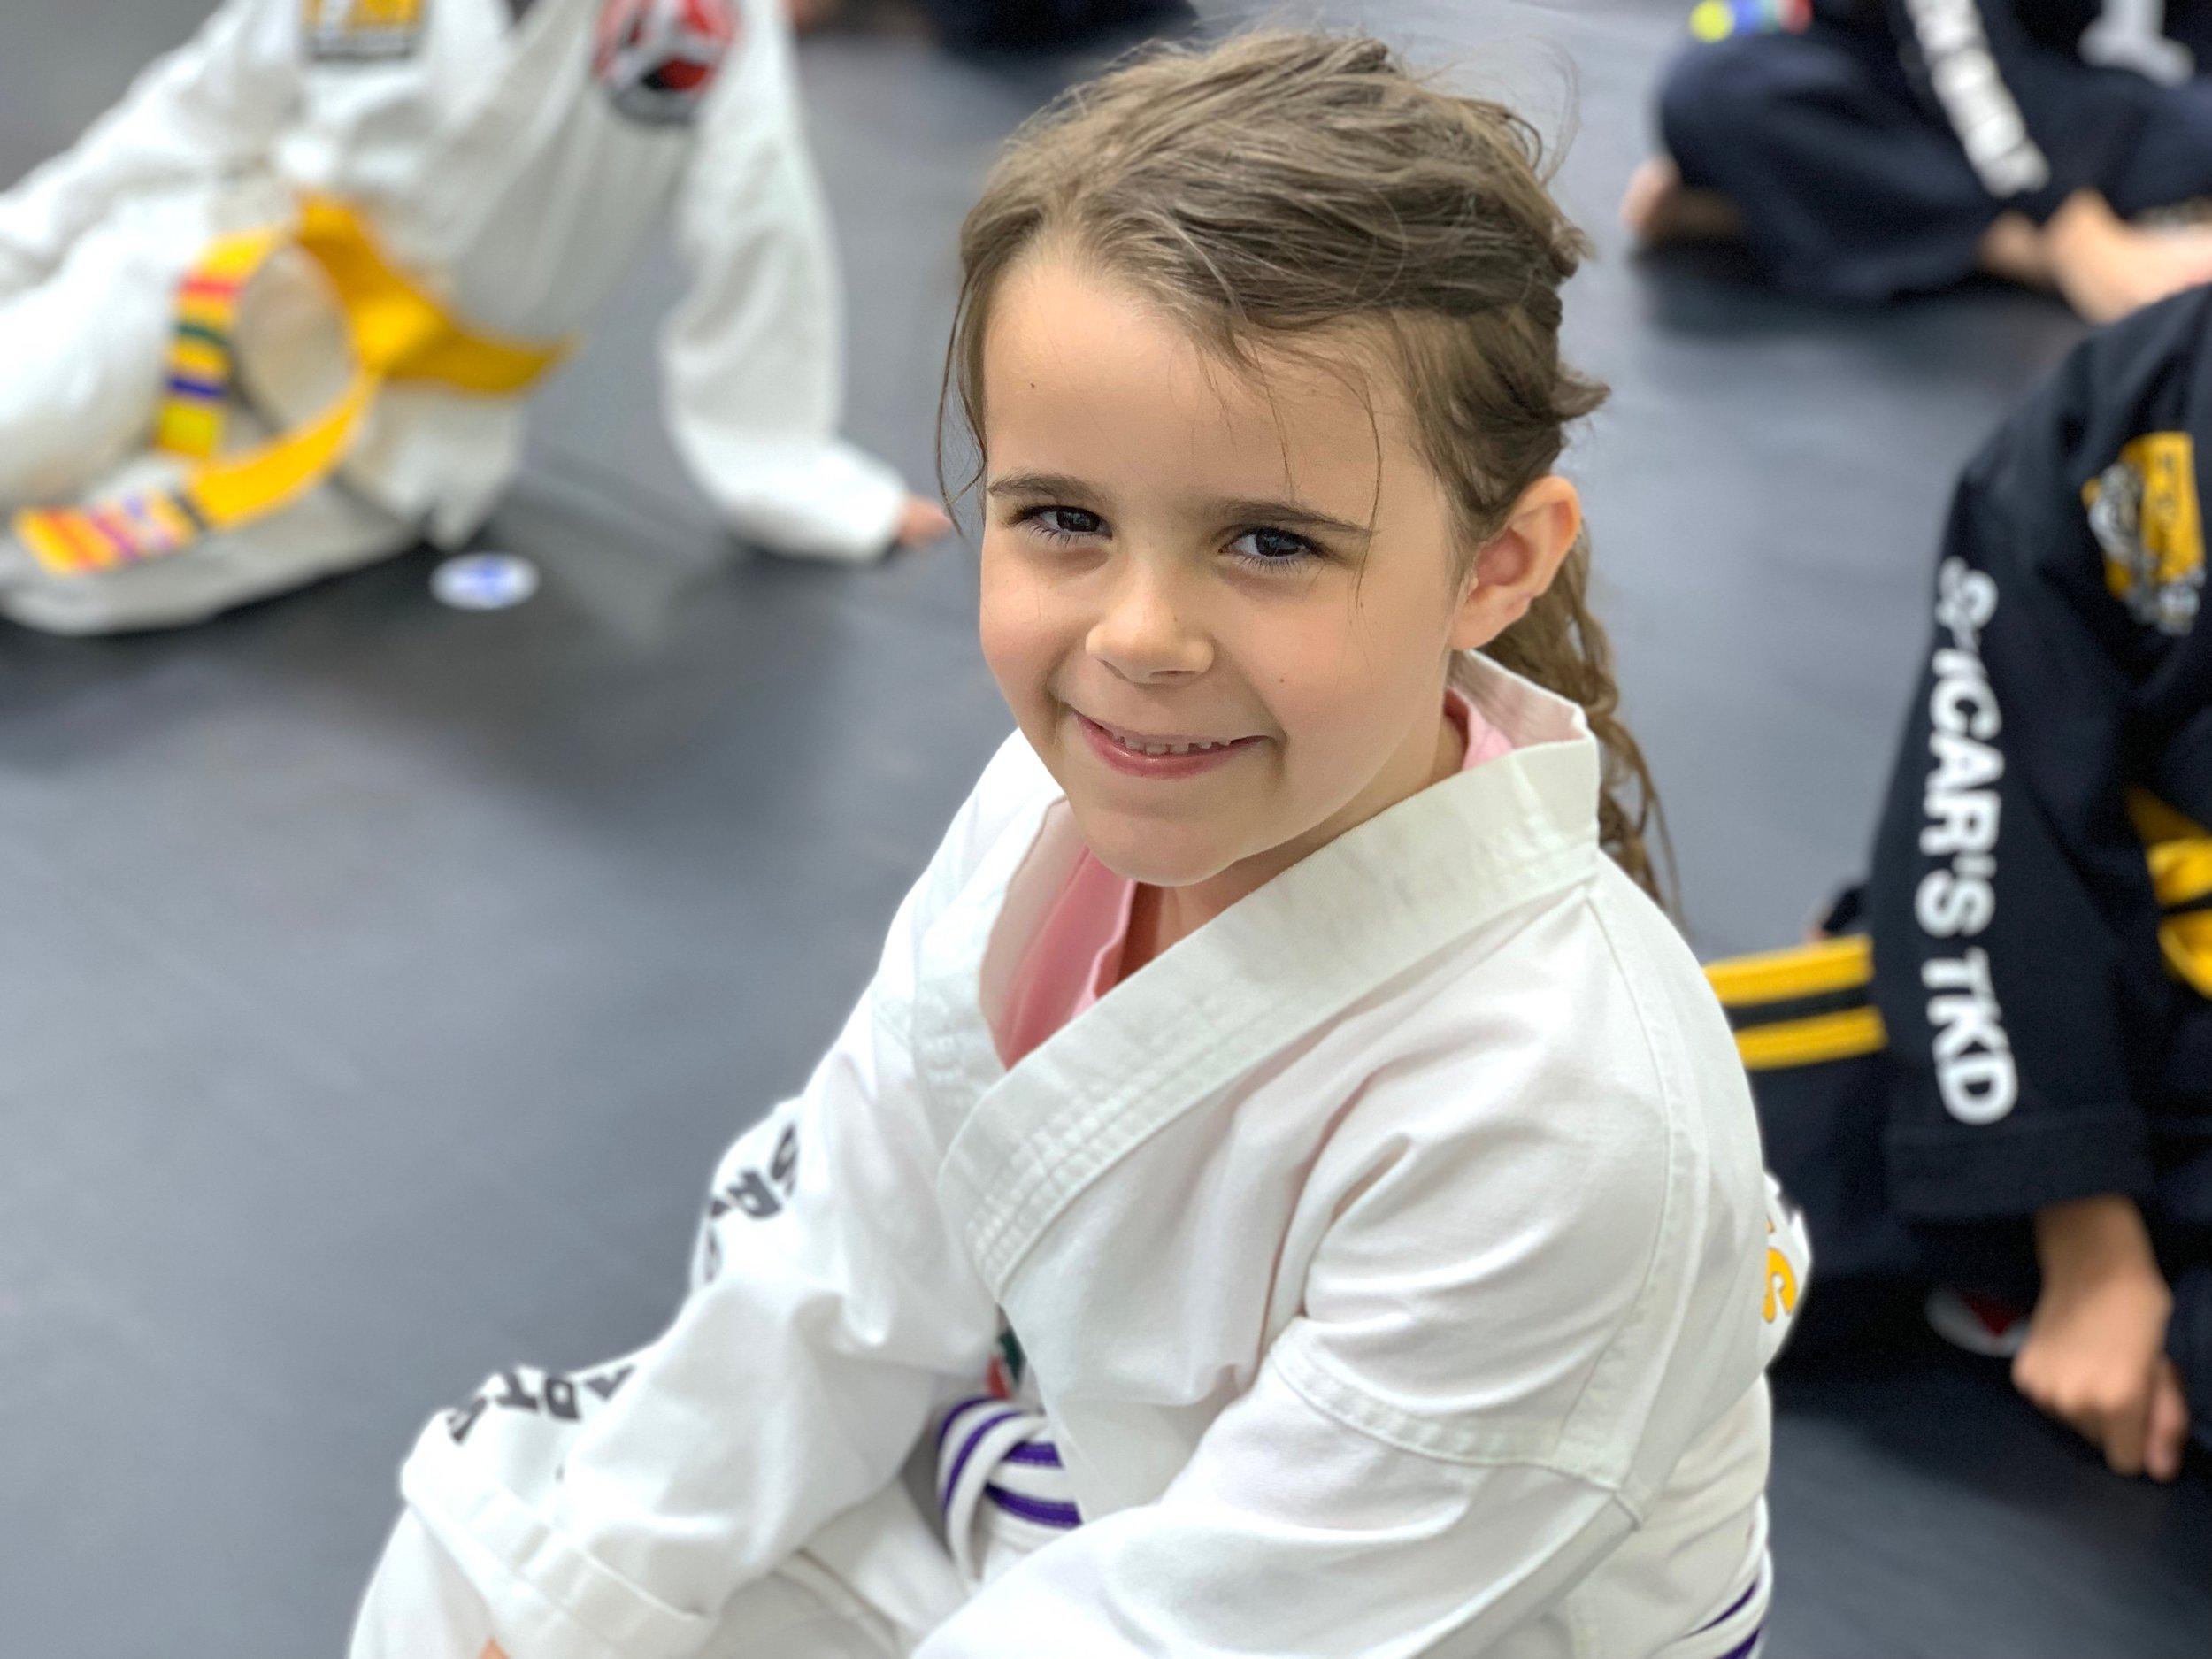 karate-kids-program-souhtlake-keller-grapevine-texas00051.jpeg